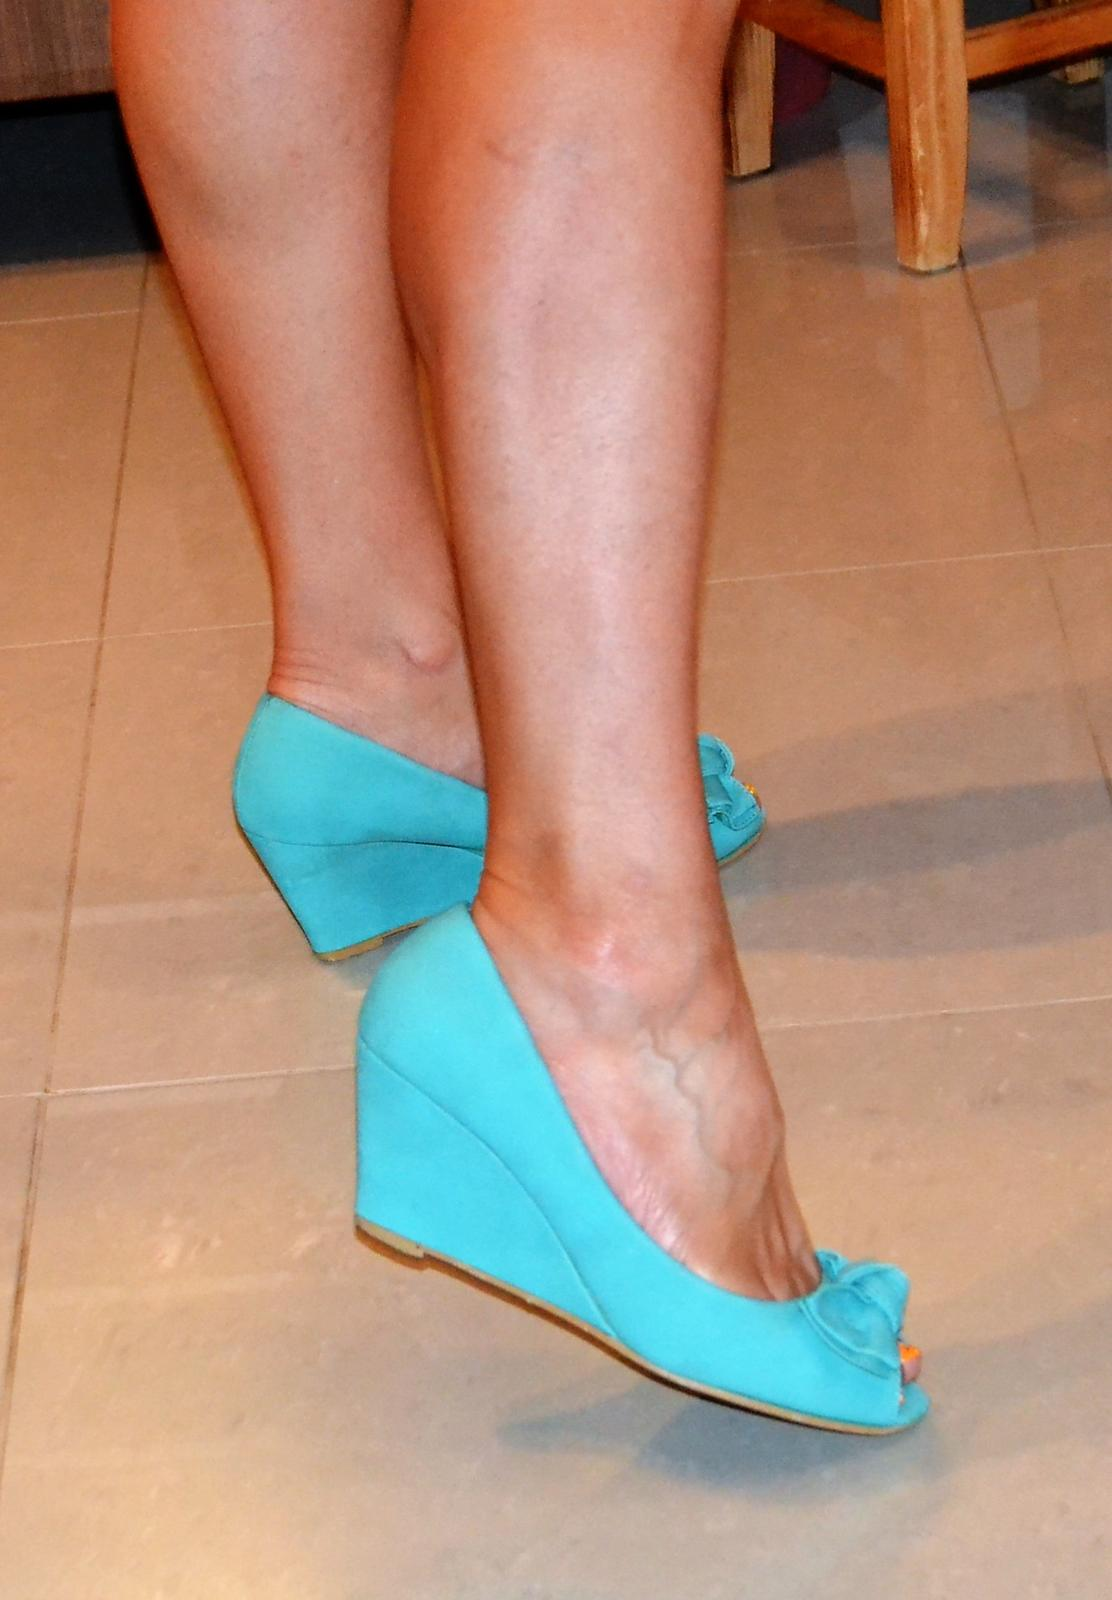 c80ab6e9ce4f2 Tyrkysové topánky s otvorenou špicou, 38 - 5 € | Svadobný bazár ...